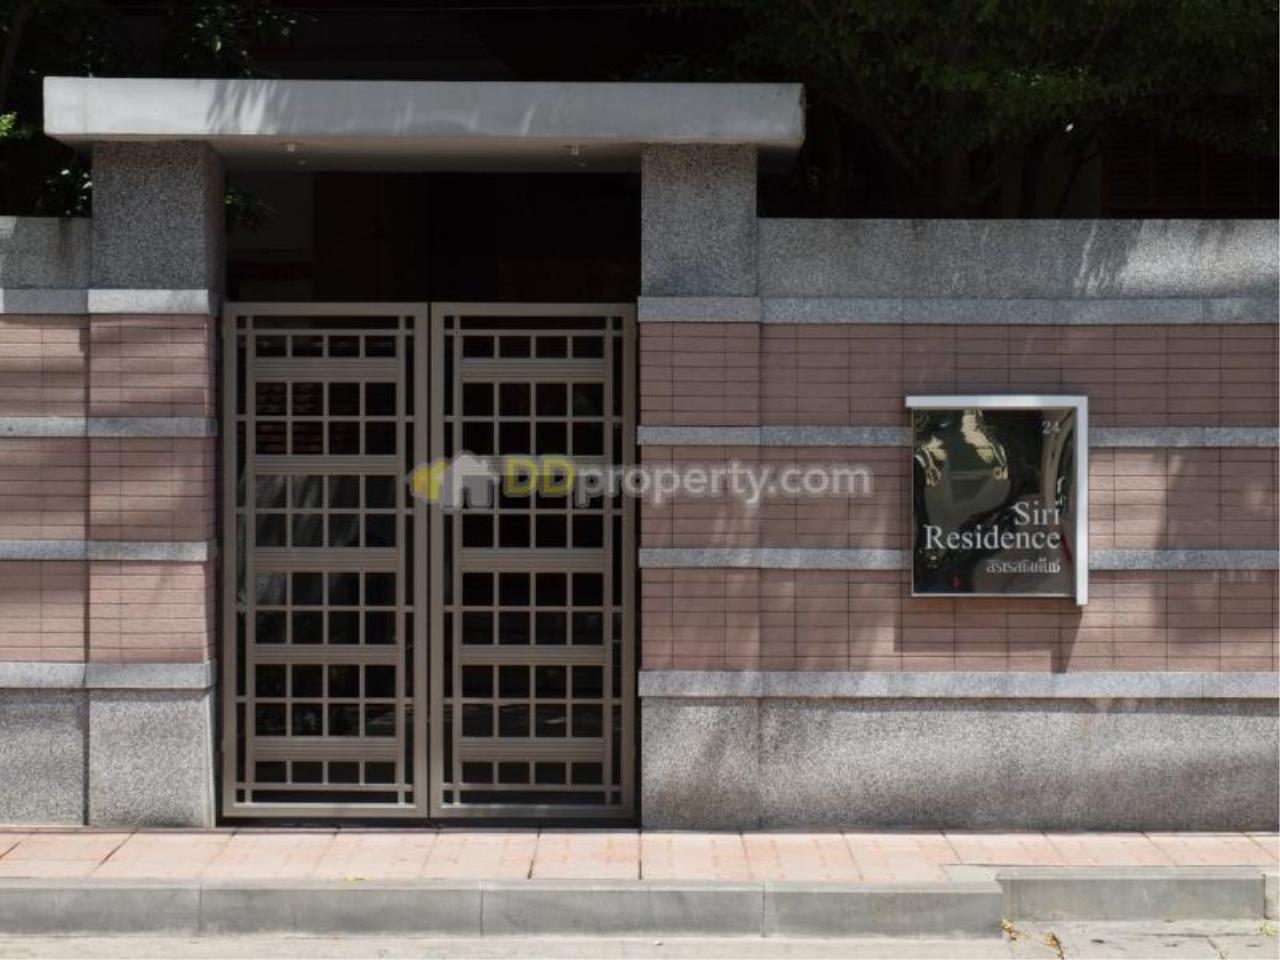 Quality Life Property Agency's ***R E N T*** ! SIRI RESIDENCE | 2 BED 2 BATH | 110 SQ. M. 2